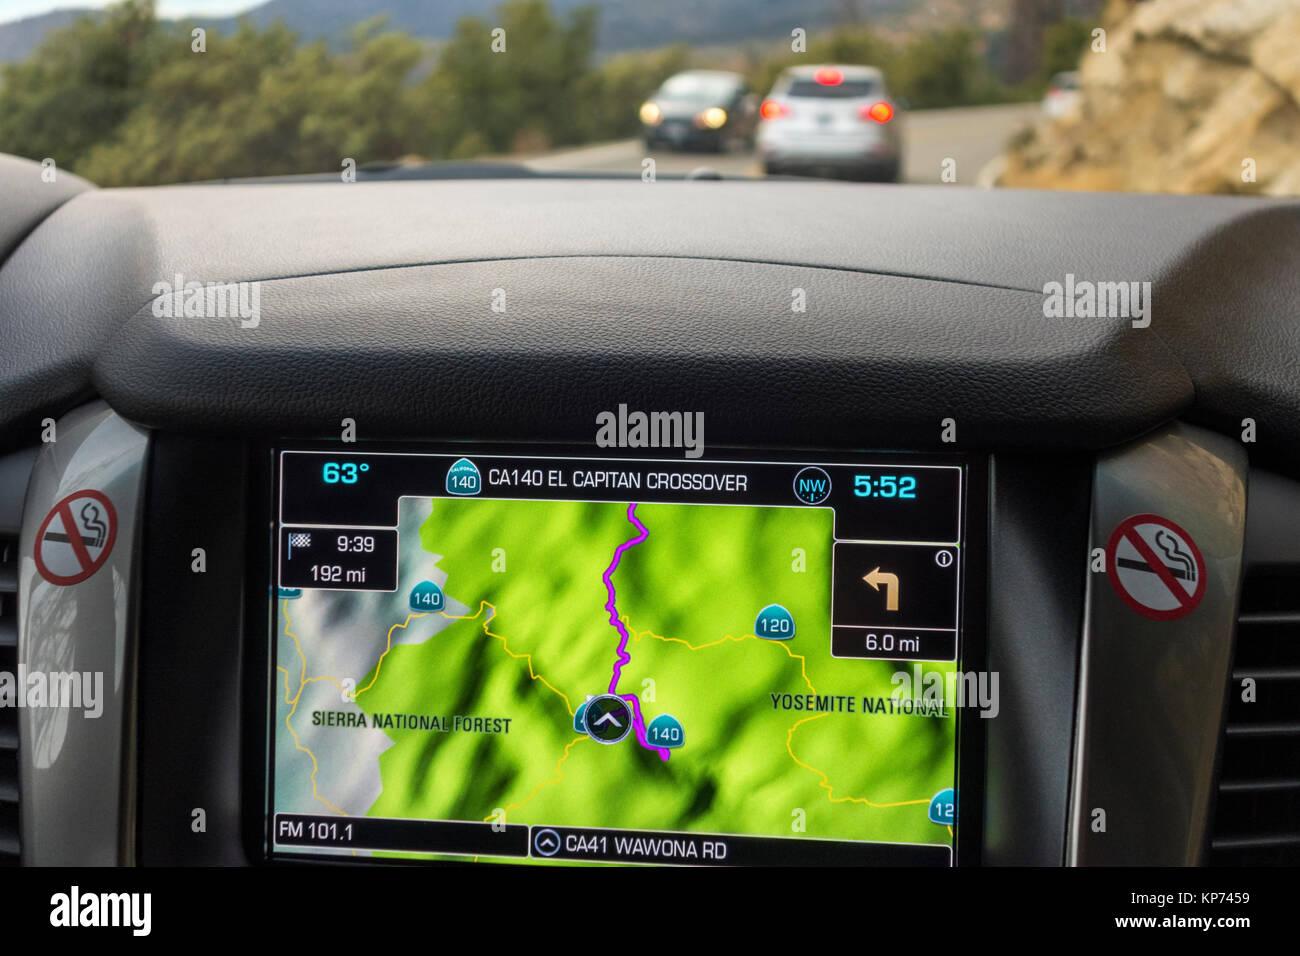 https://c7.alamy.com/comp/KP7459/sat-nav-satnav-gps-car-navigation-integrated-in-dashboard-in-american-KP7459.jpg